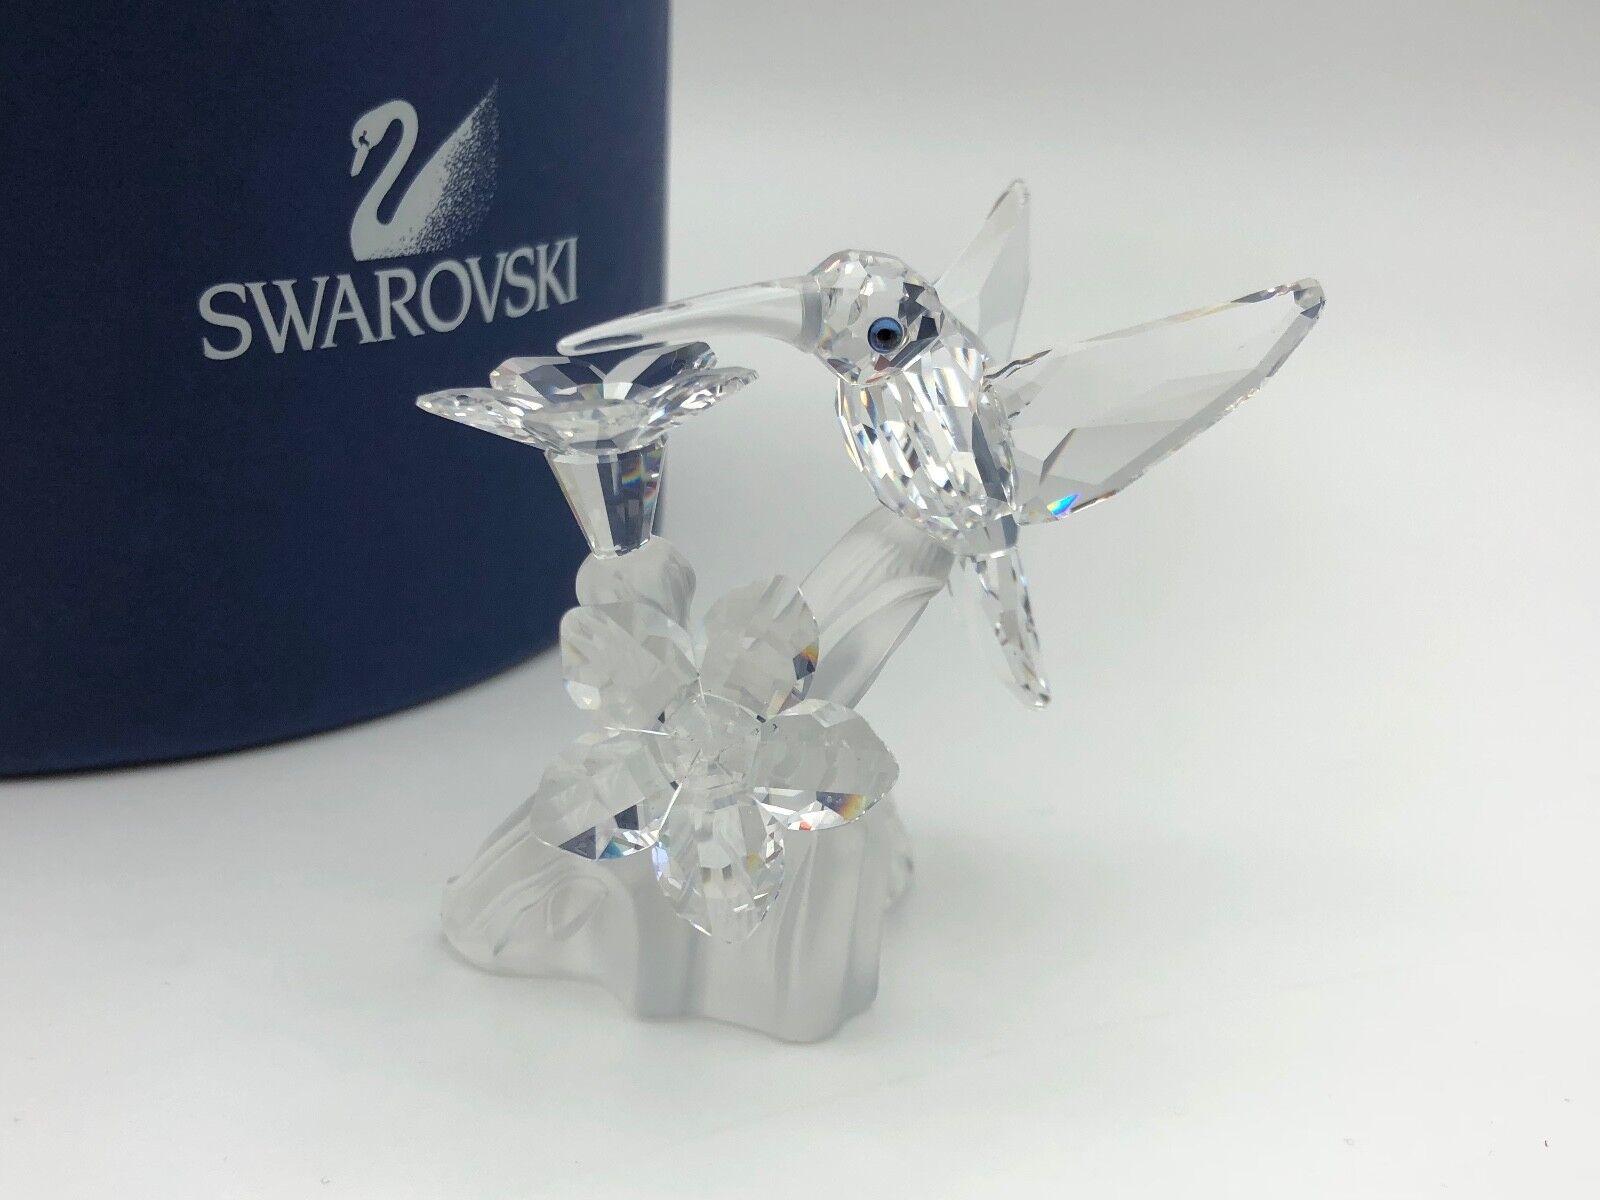 Swarovski Figur Kolibri 7 cm mit Ovp & Zertifikat. Top Zustand.